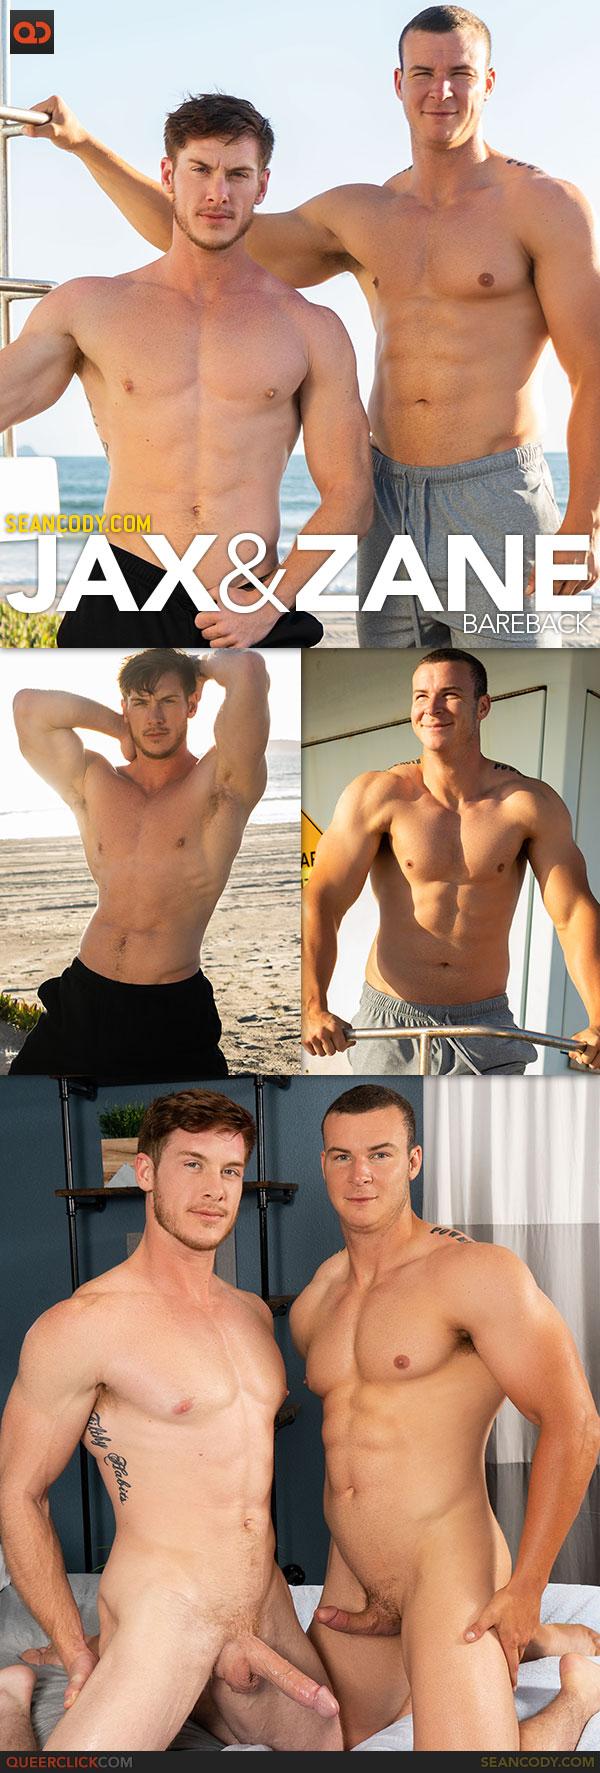 Sean Cody: Jax And Zane